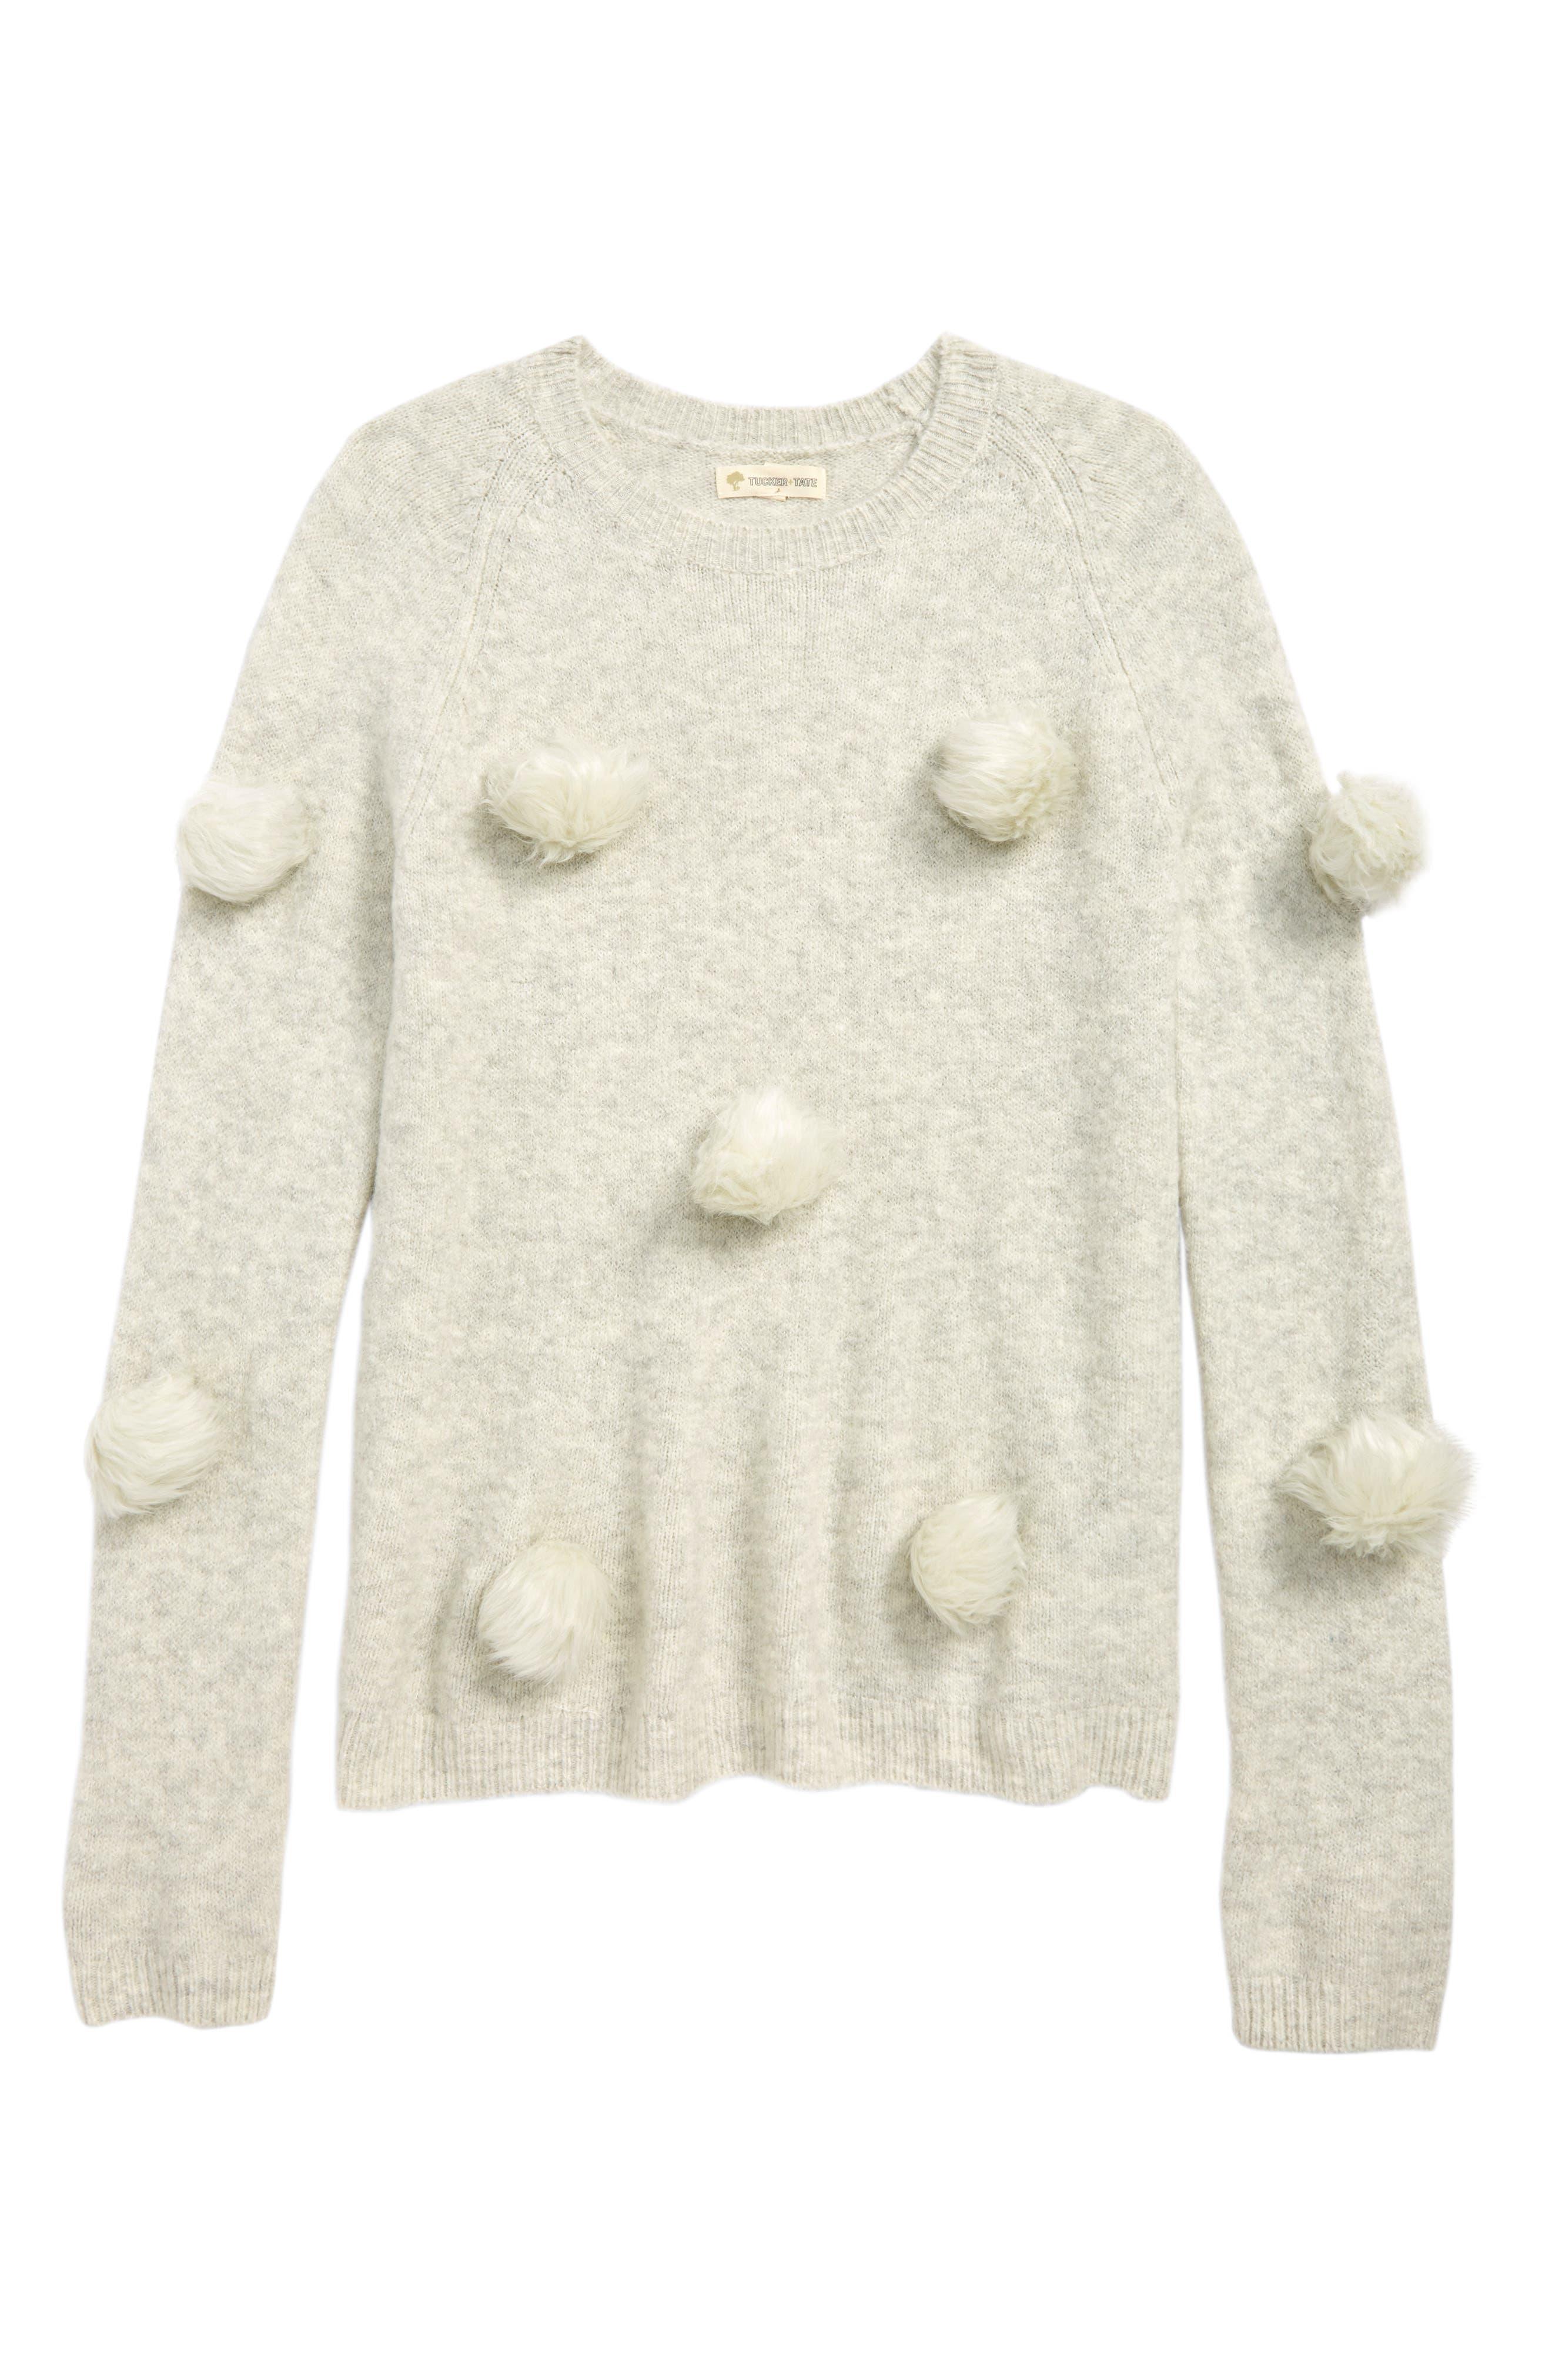 Faux Fur Pompom Sweater,                             Main thumbnail 1, color,                             IVORY EGRET HEATHER